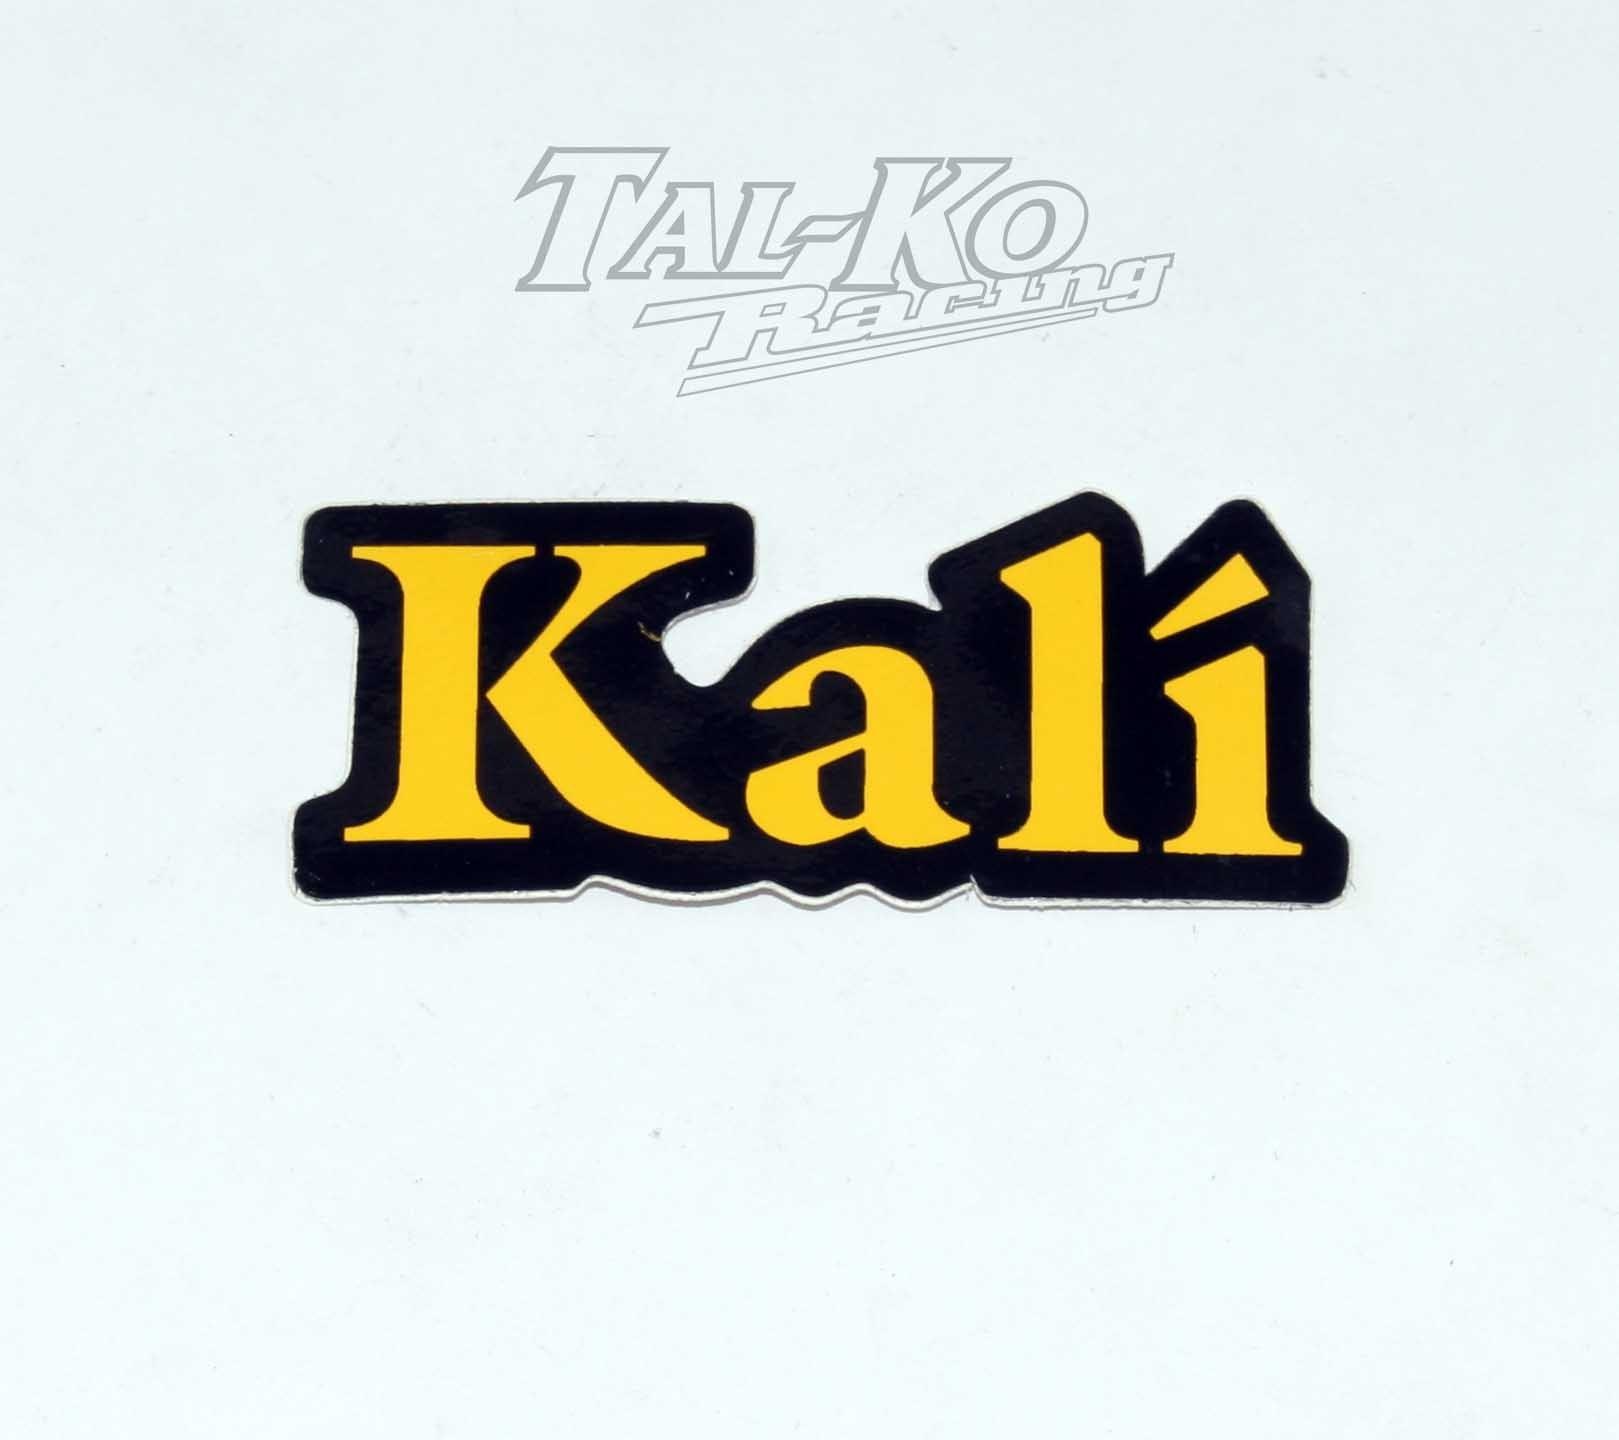 CRG KALI STICKER DECAL 83 x 34